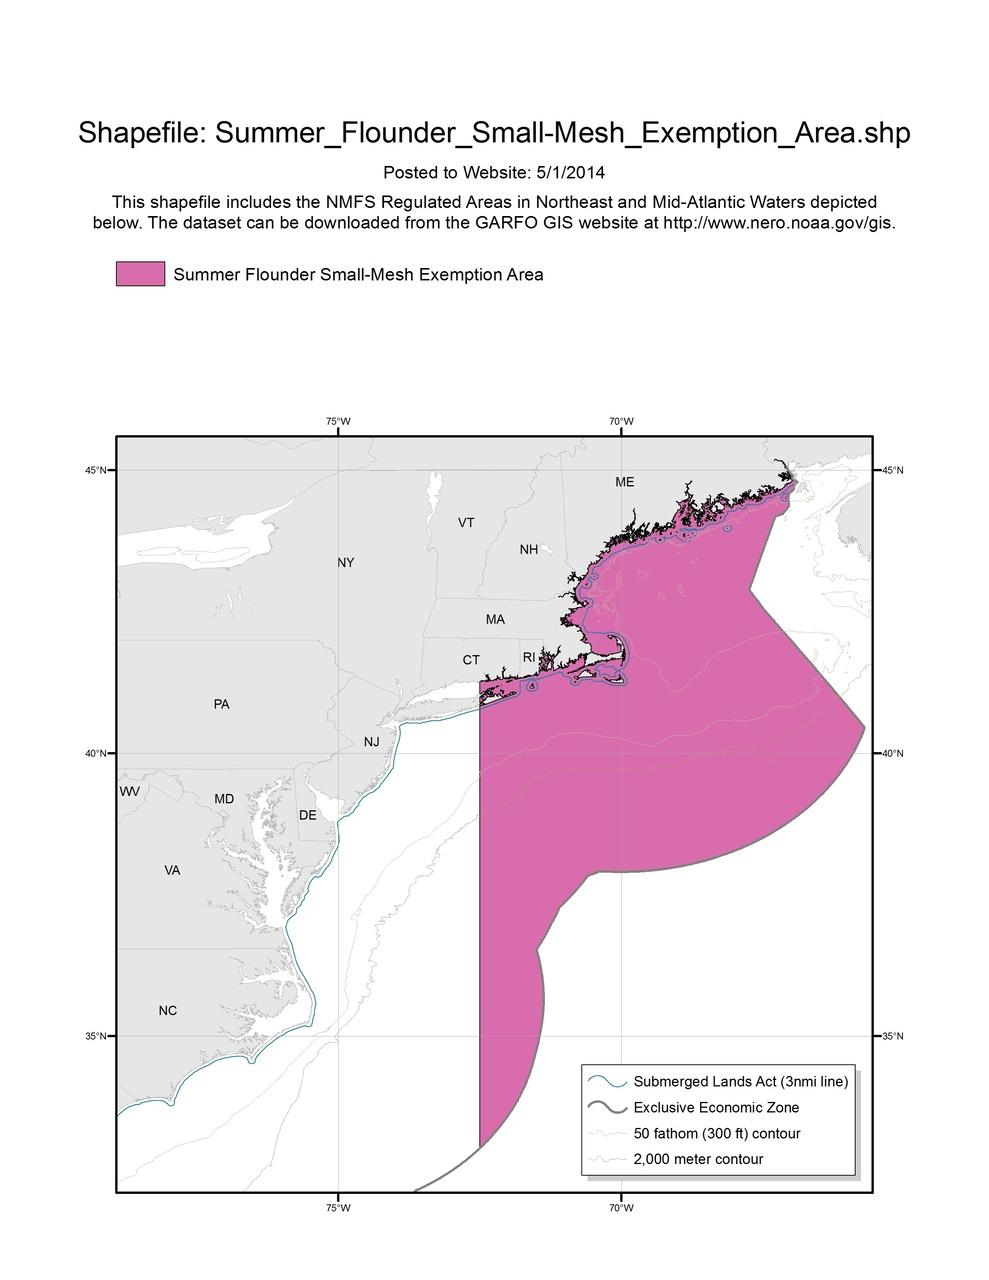 Summer-Flounder-Small-Mesh-Exemption-Area-MAP-NOAA-GARFO.jpg